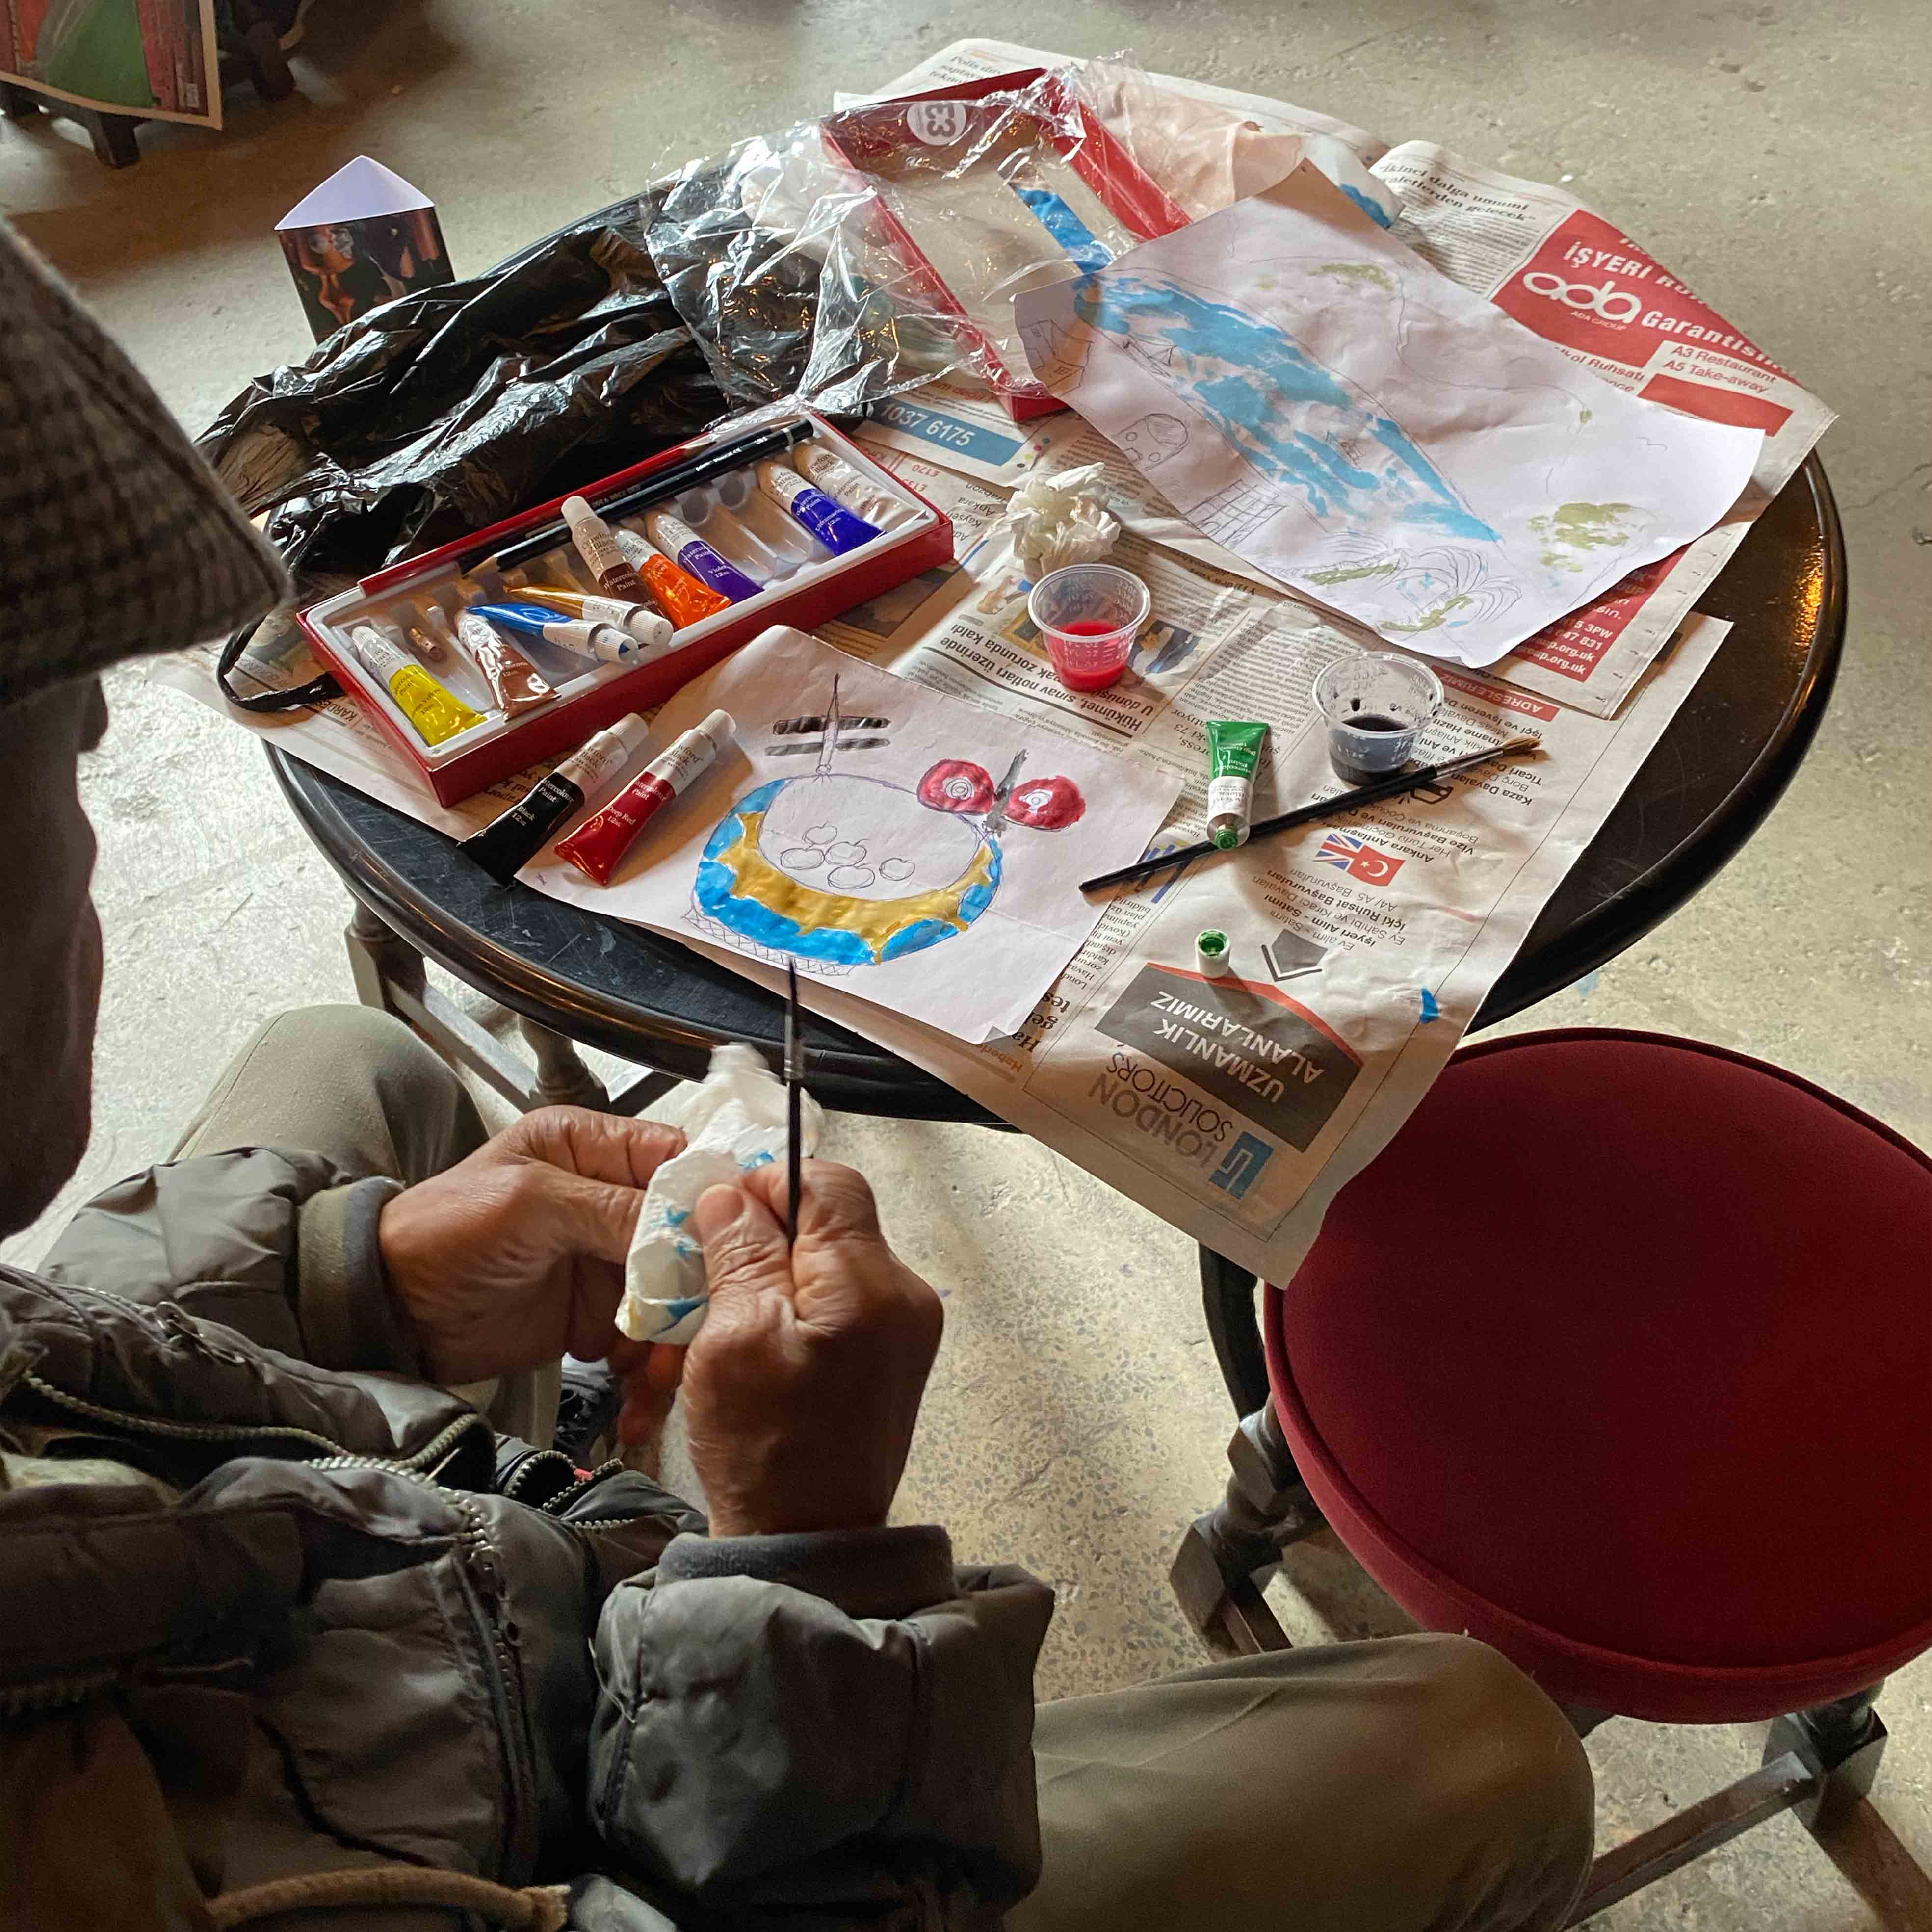 An elderly man painting